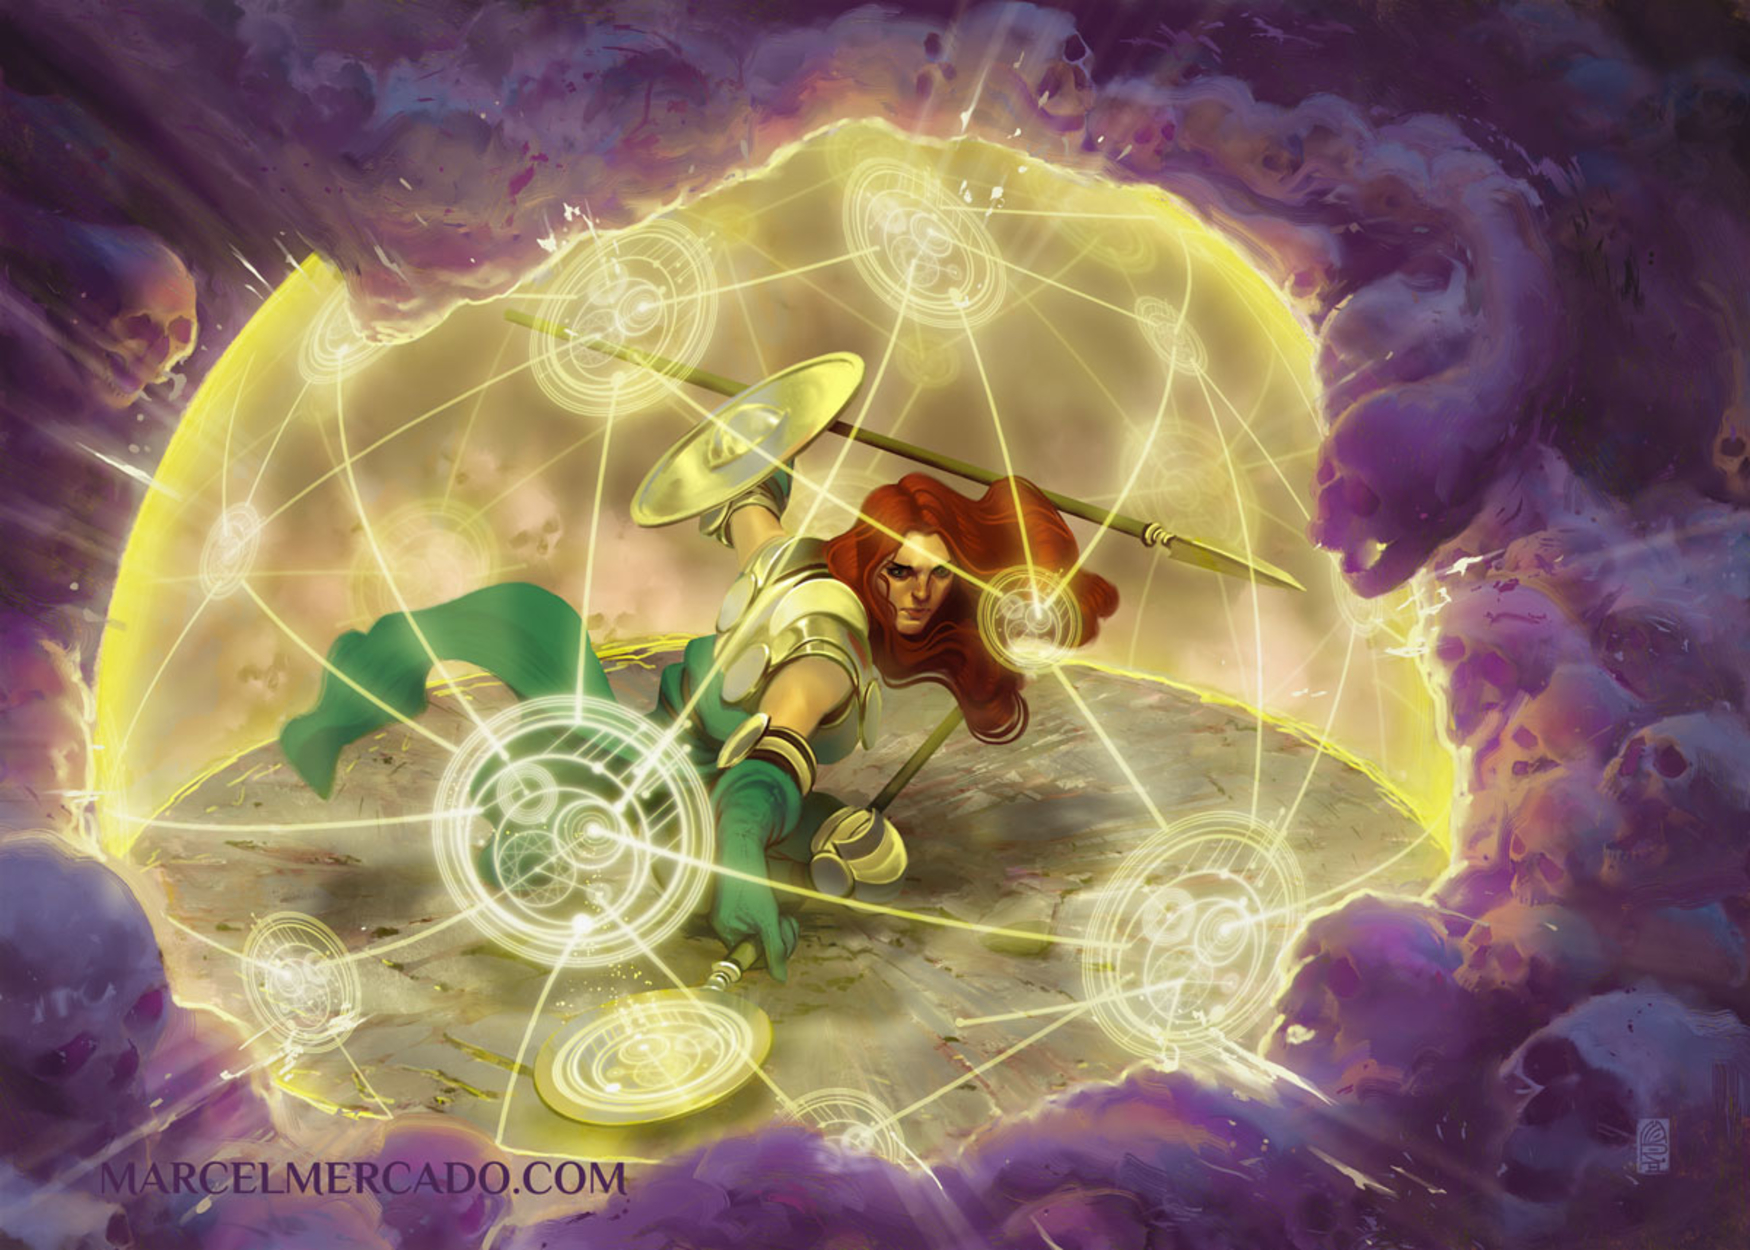 Angelic Magic Artwork by Marcel Mercado